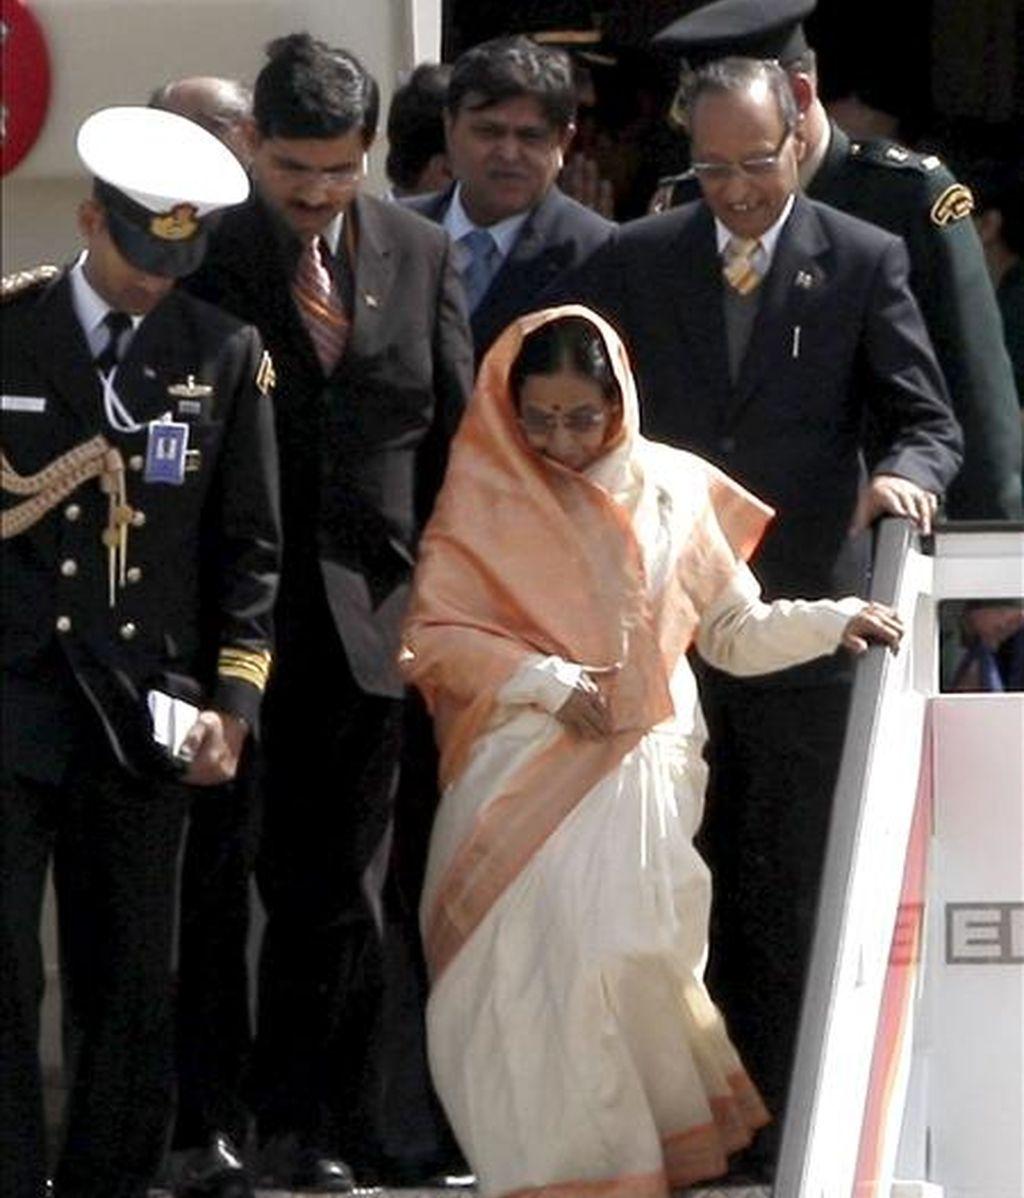 La presidenta de la India, Pratibha Patil (d-primer término), a su llegada al aeropuerto de Madrid-Barajas. EFE